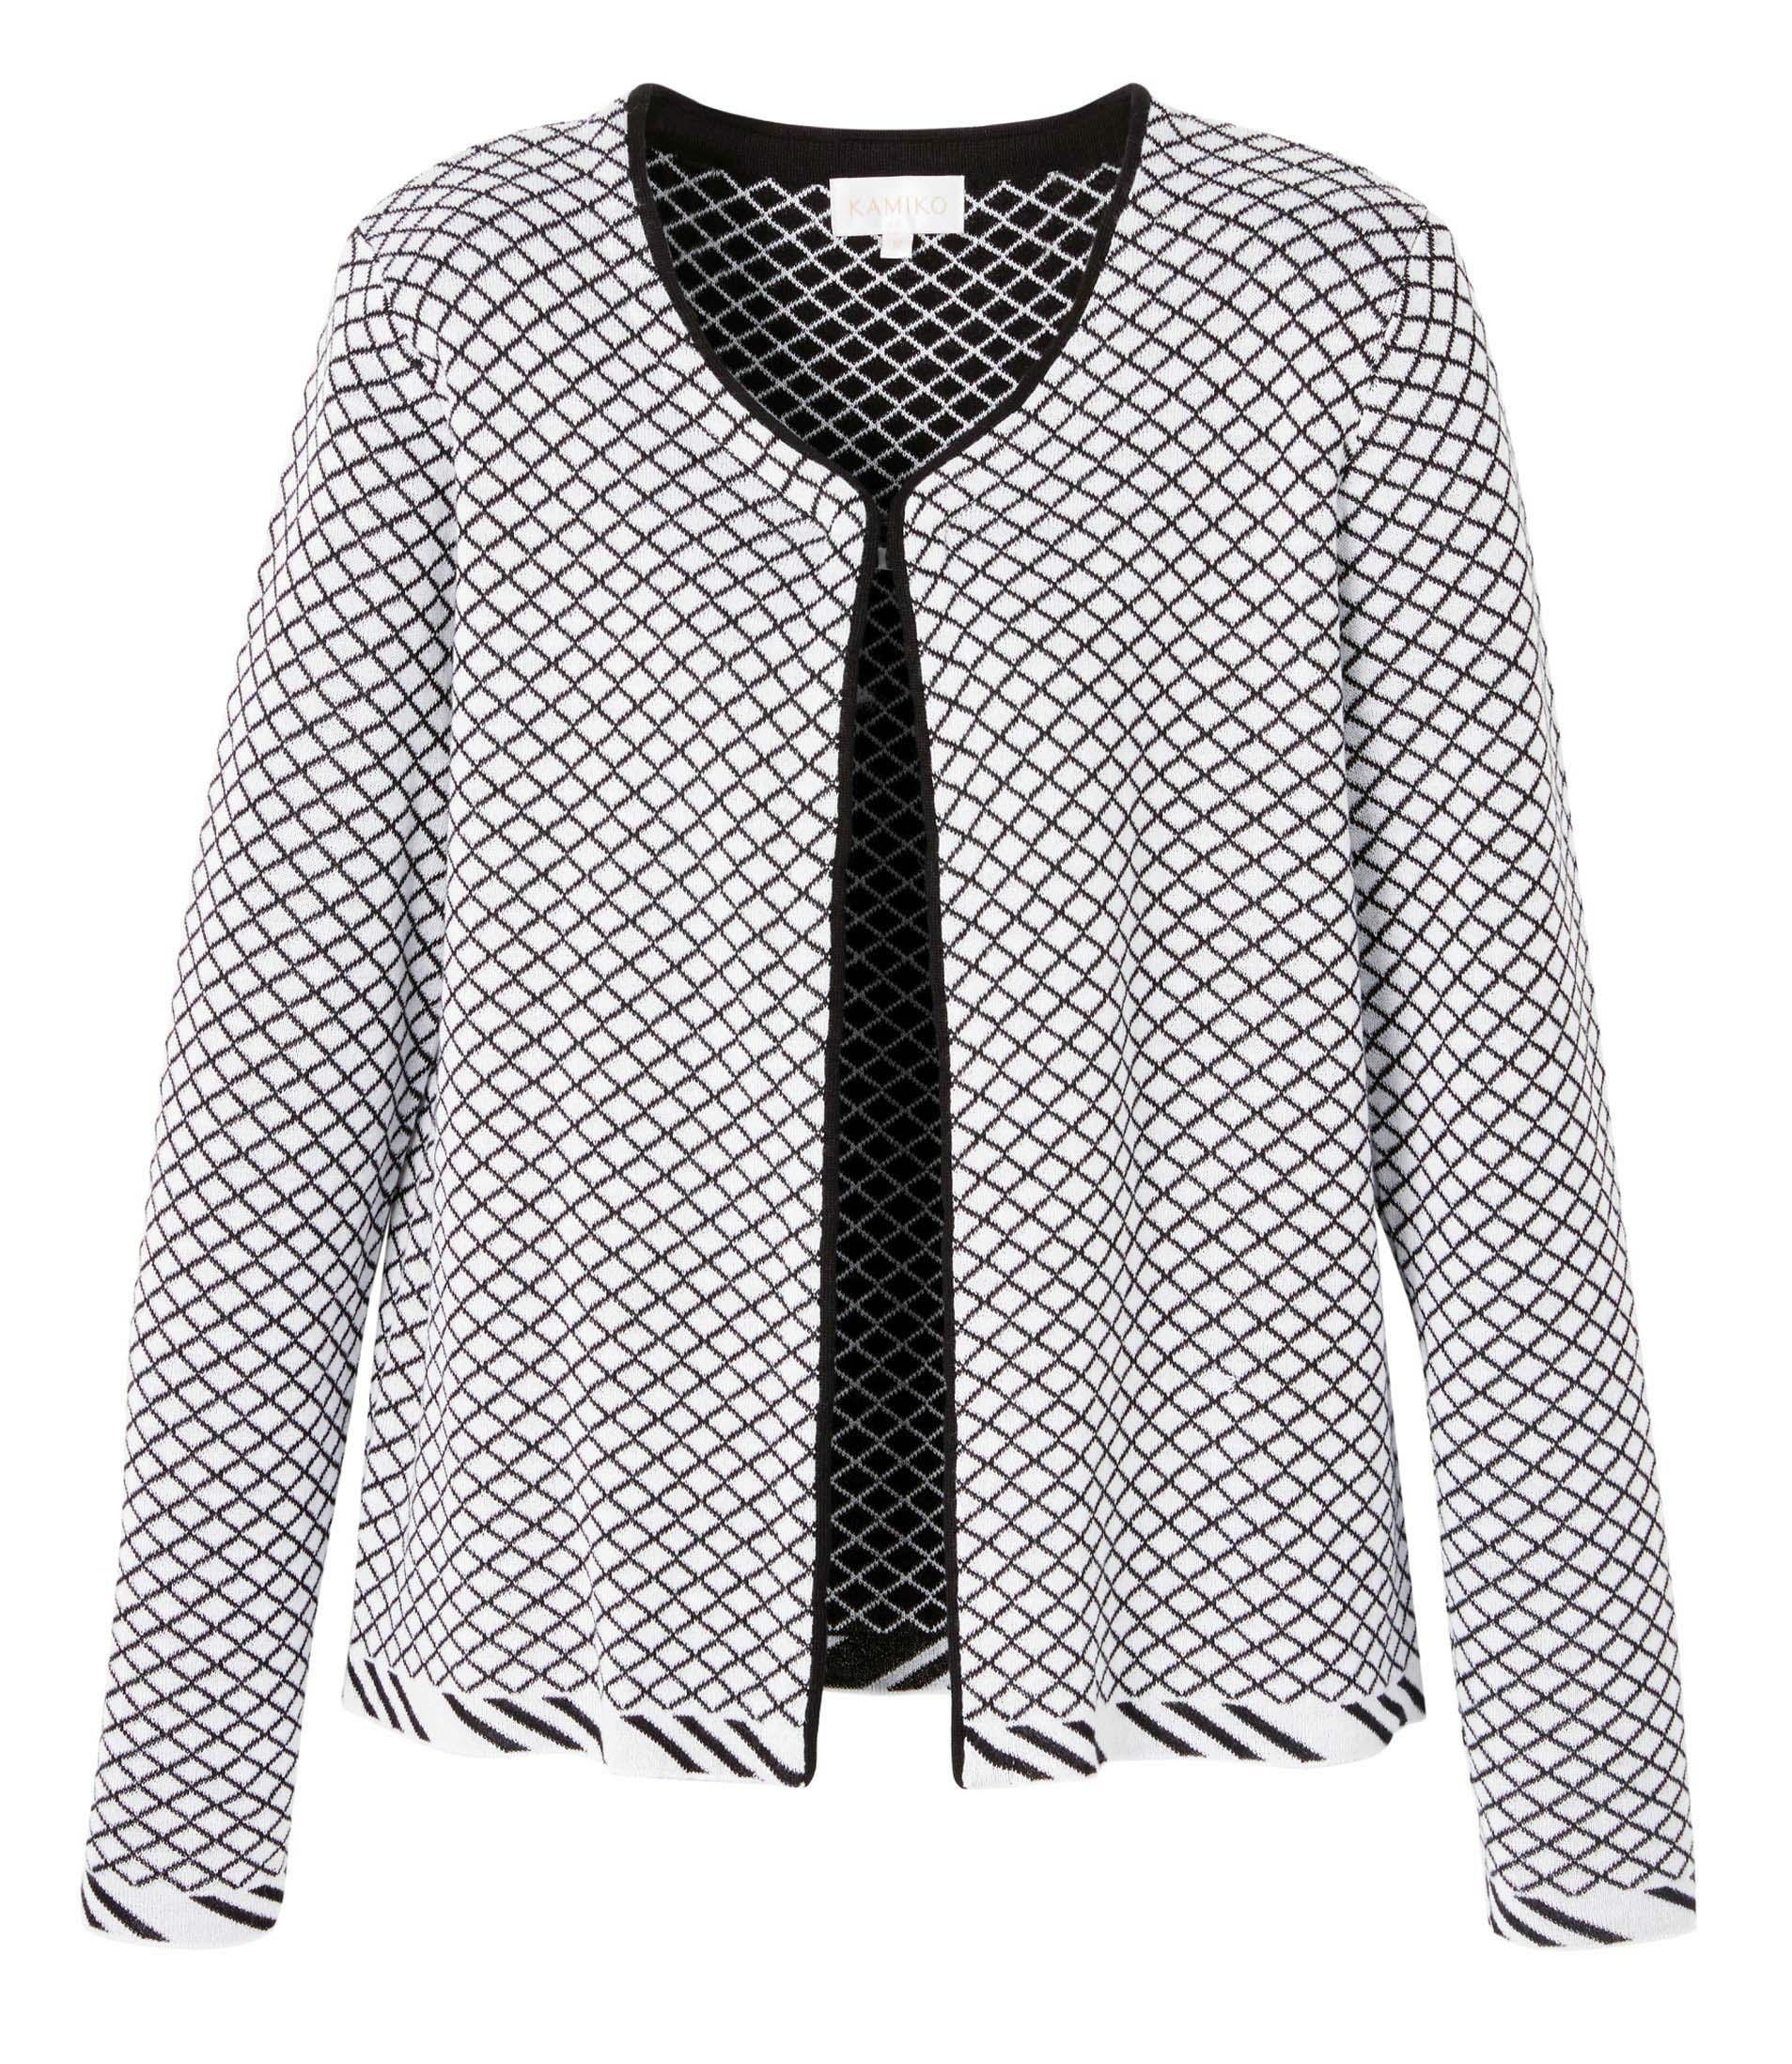 6092617 Kamiko Diamond Pattern Cardigan $119.99 Instore 3 Mar 2016